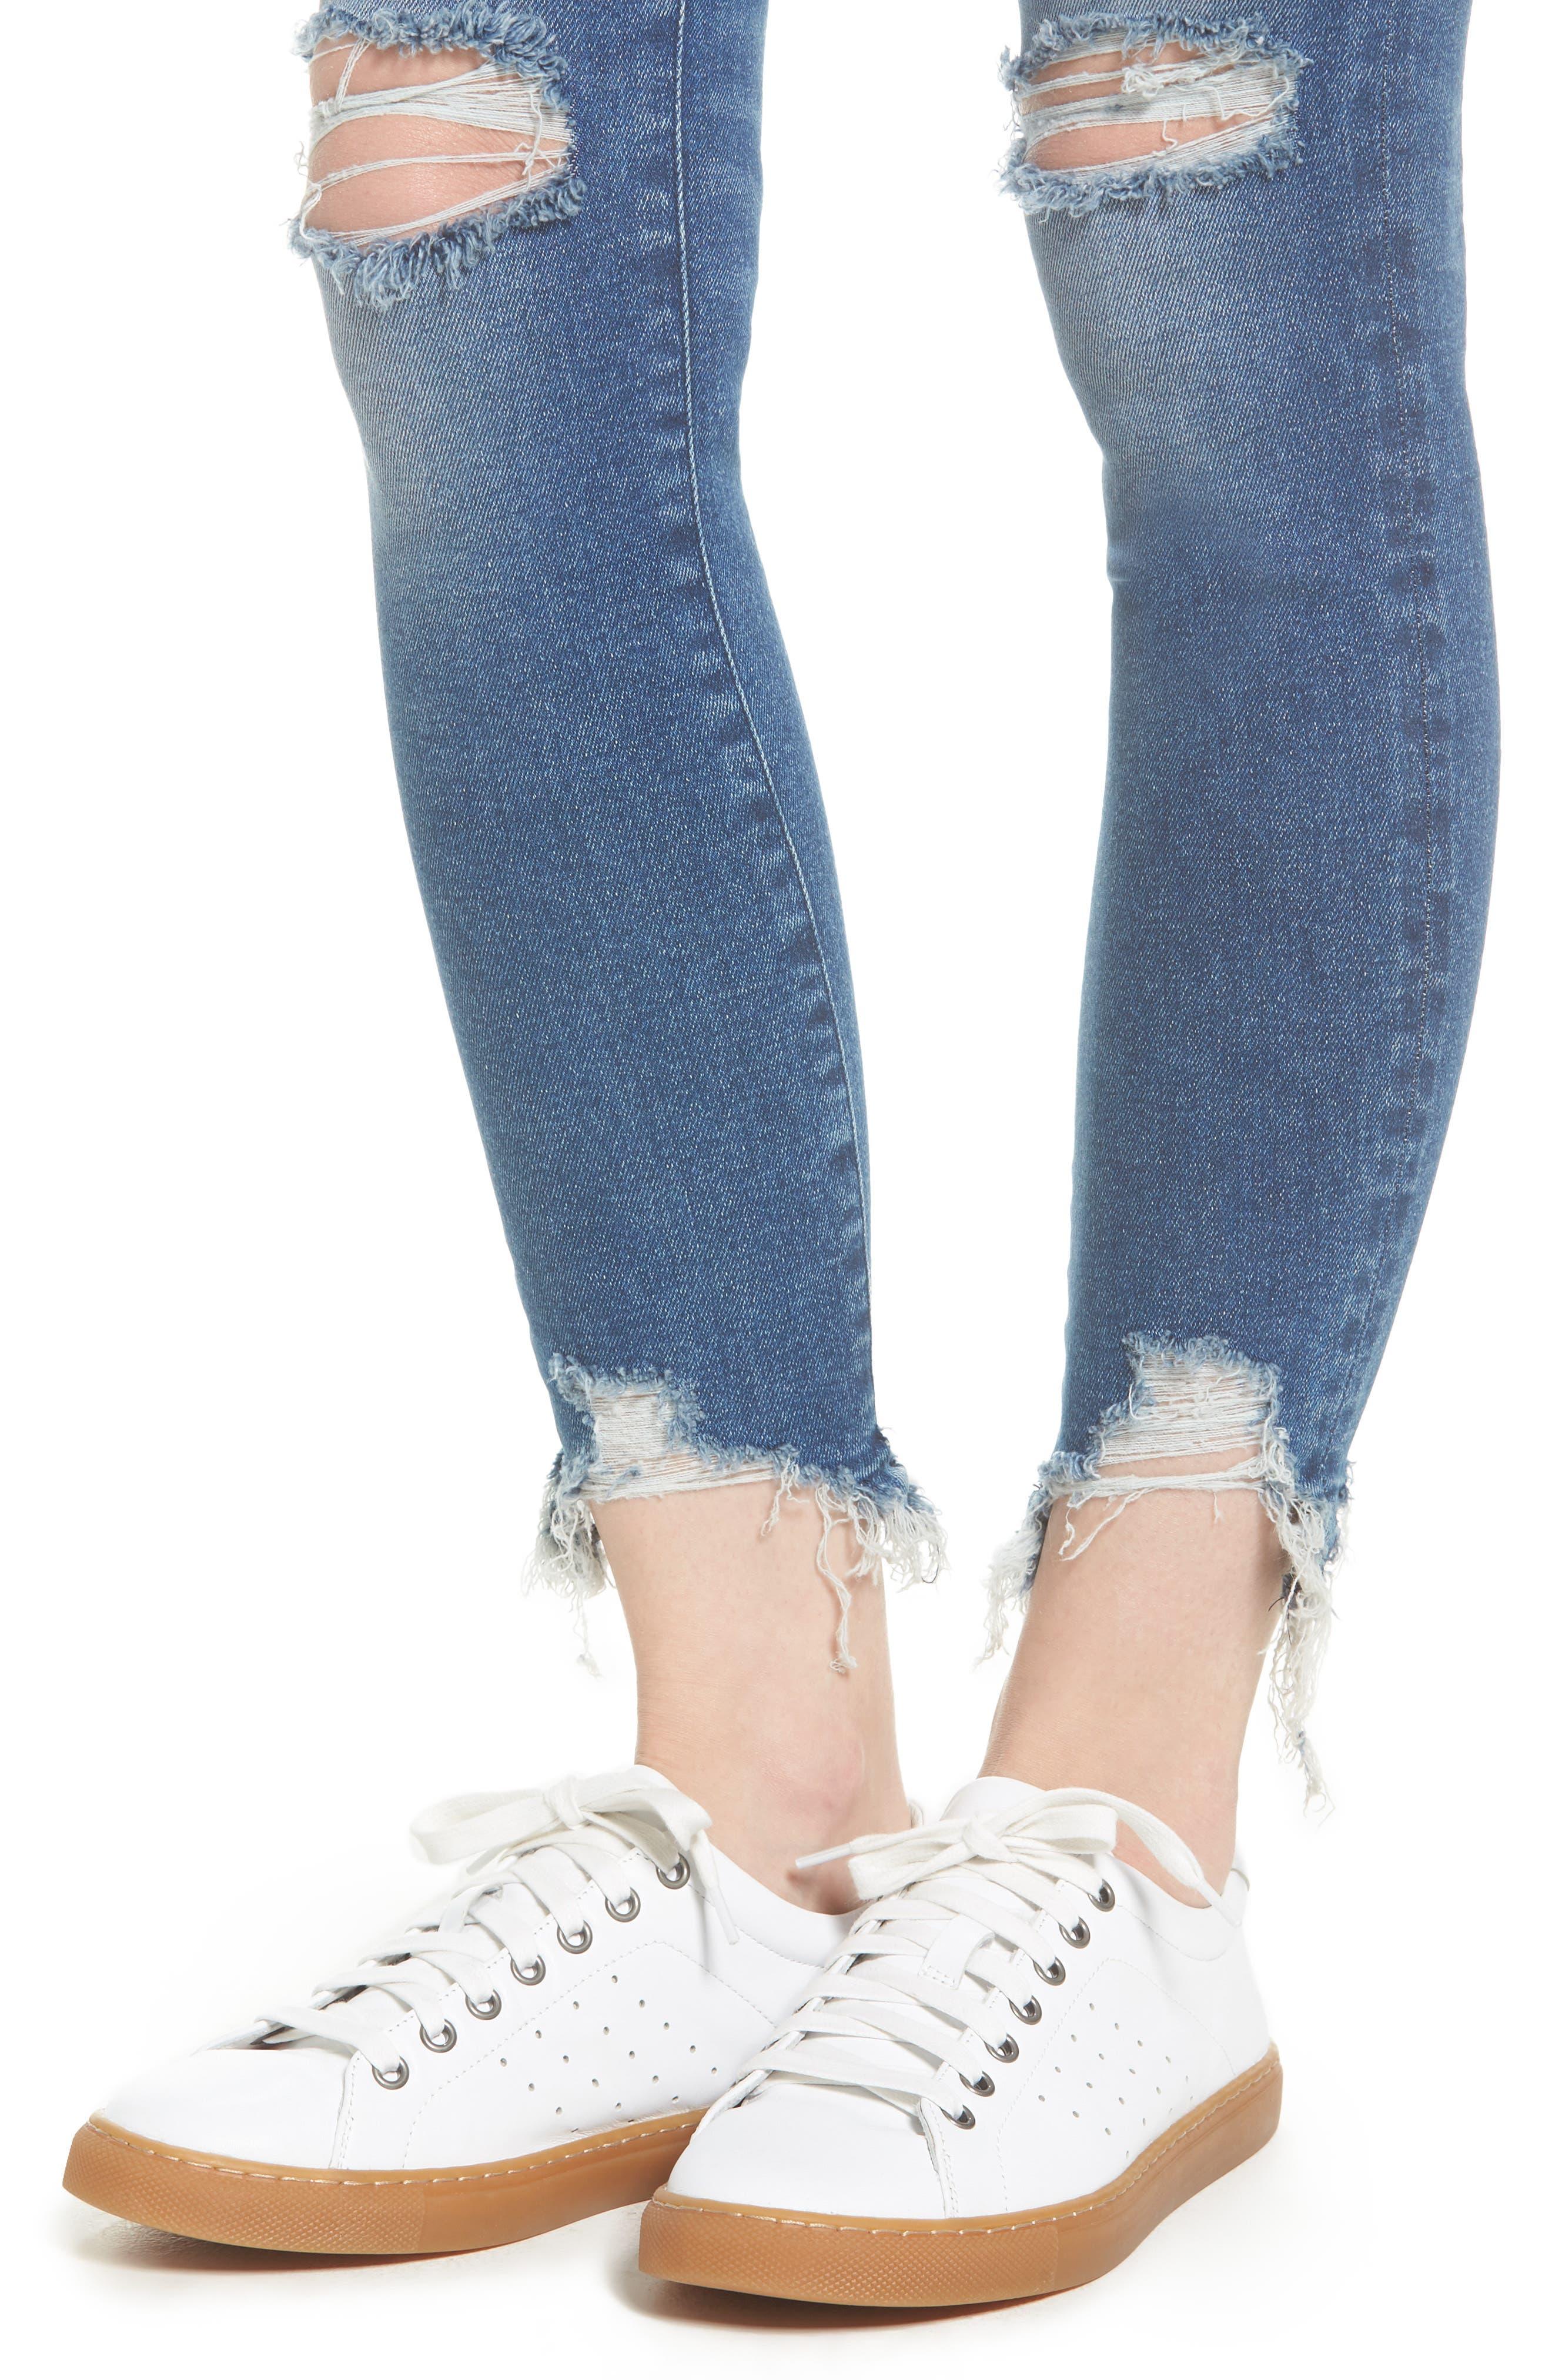 Farrow Instaslim High Waist Ankle Skinny Jeans,                             Alternate thumbnail 4, color,                             LARAMIE